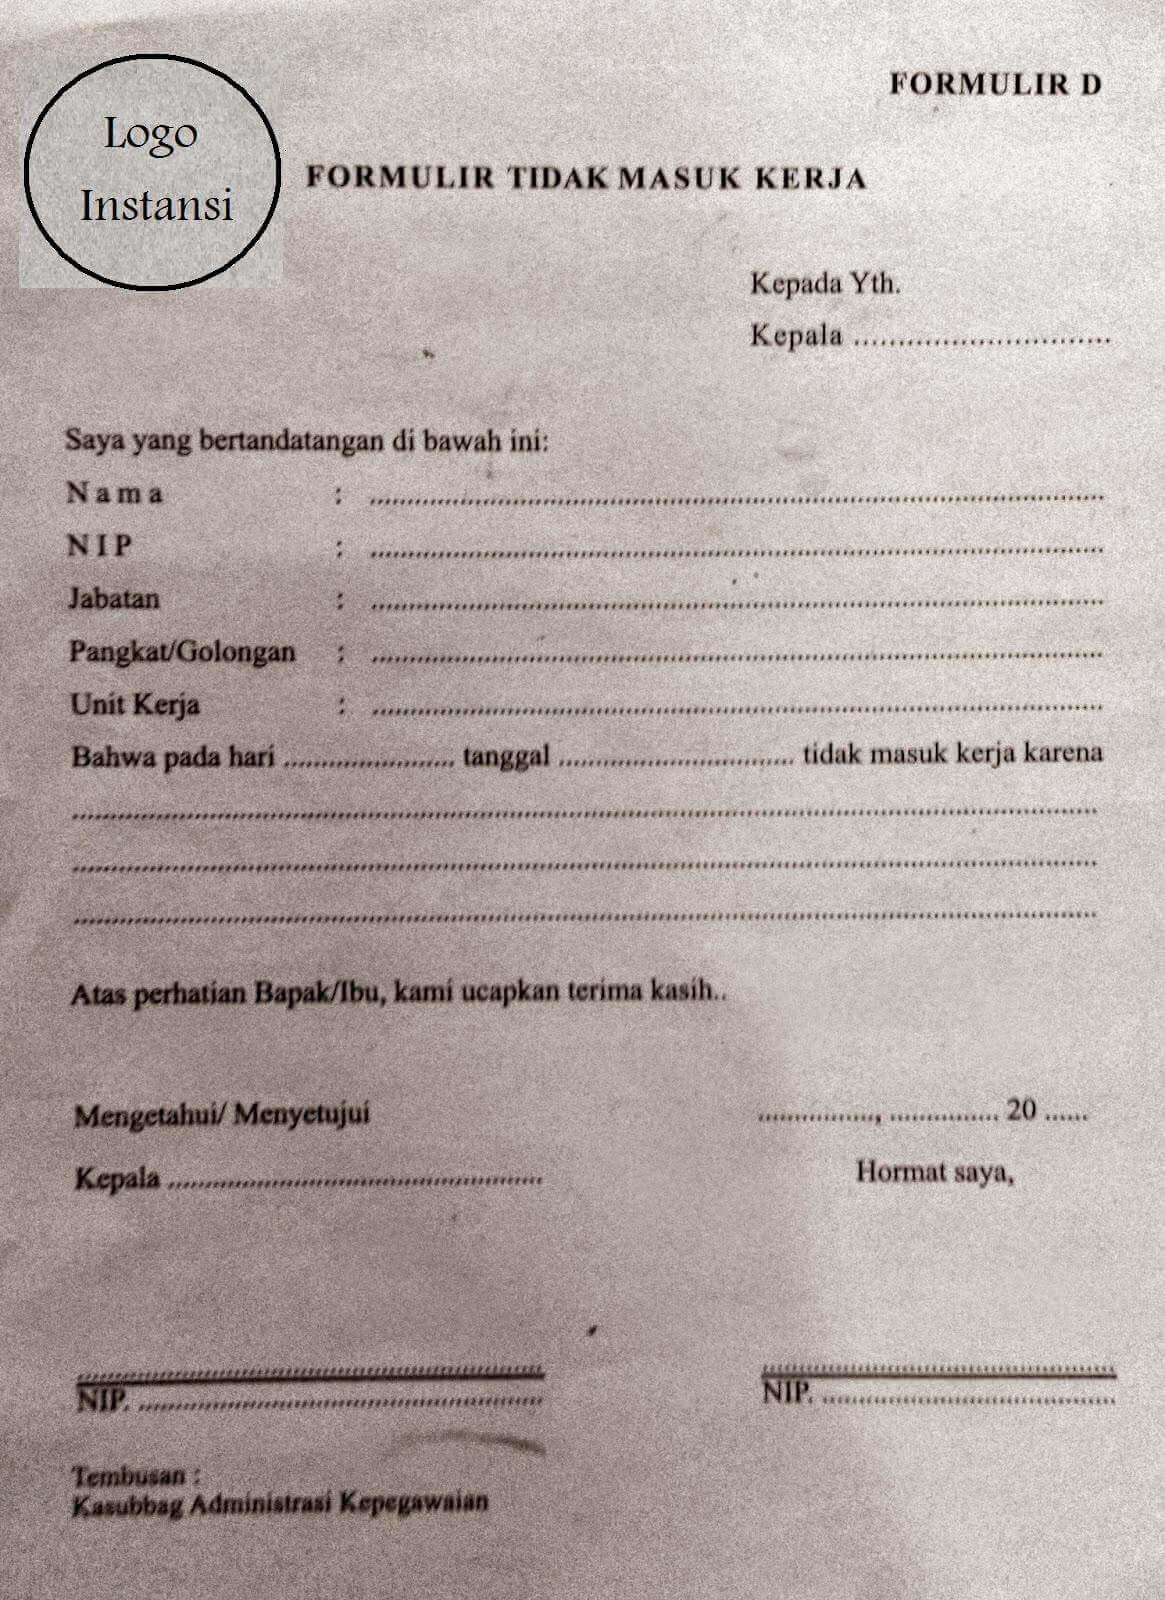 Contoh Surat Izin Tidak Masuk Kerja PNS